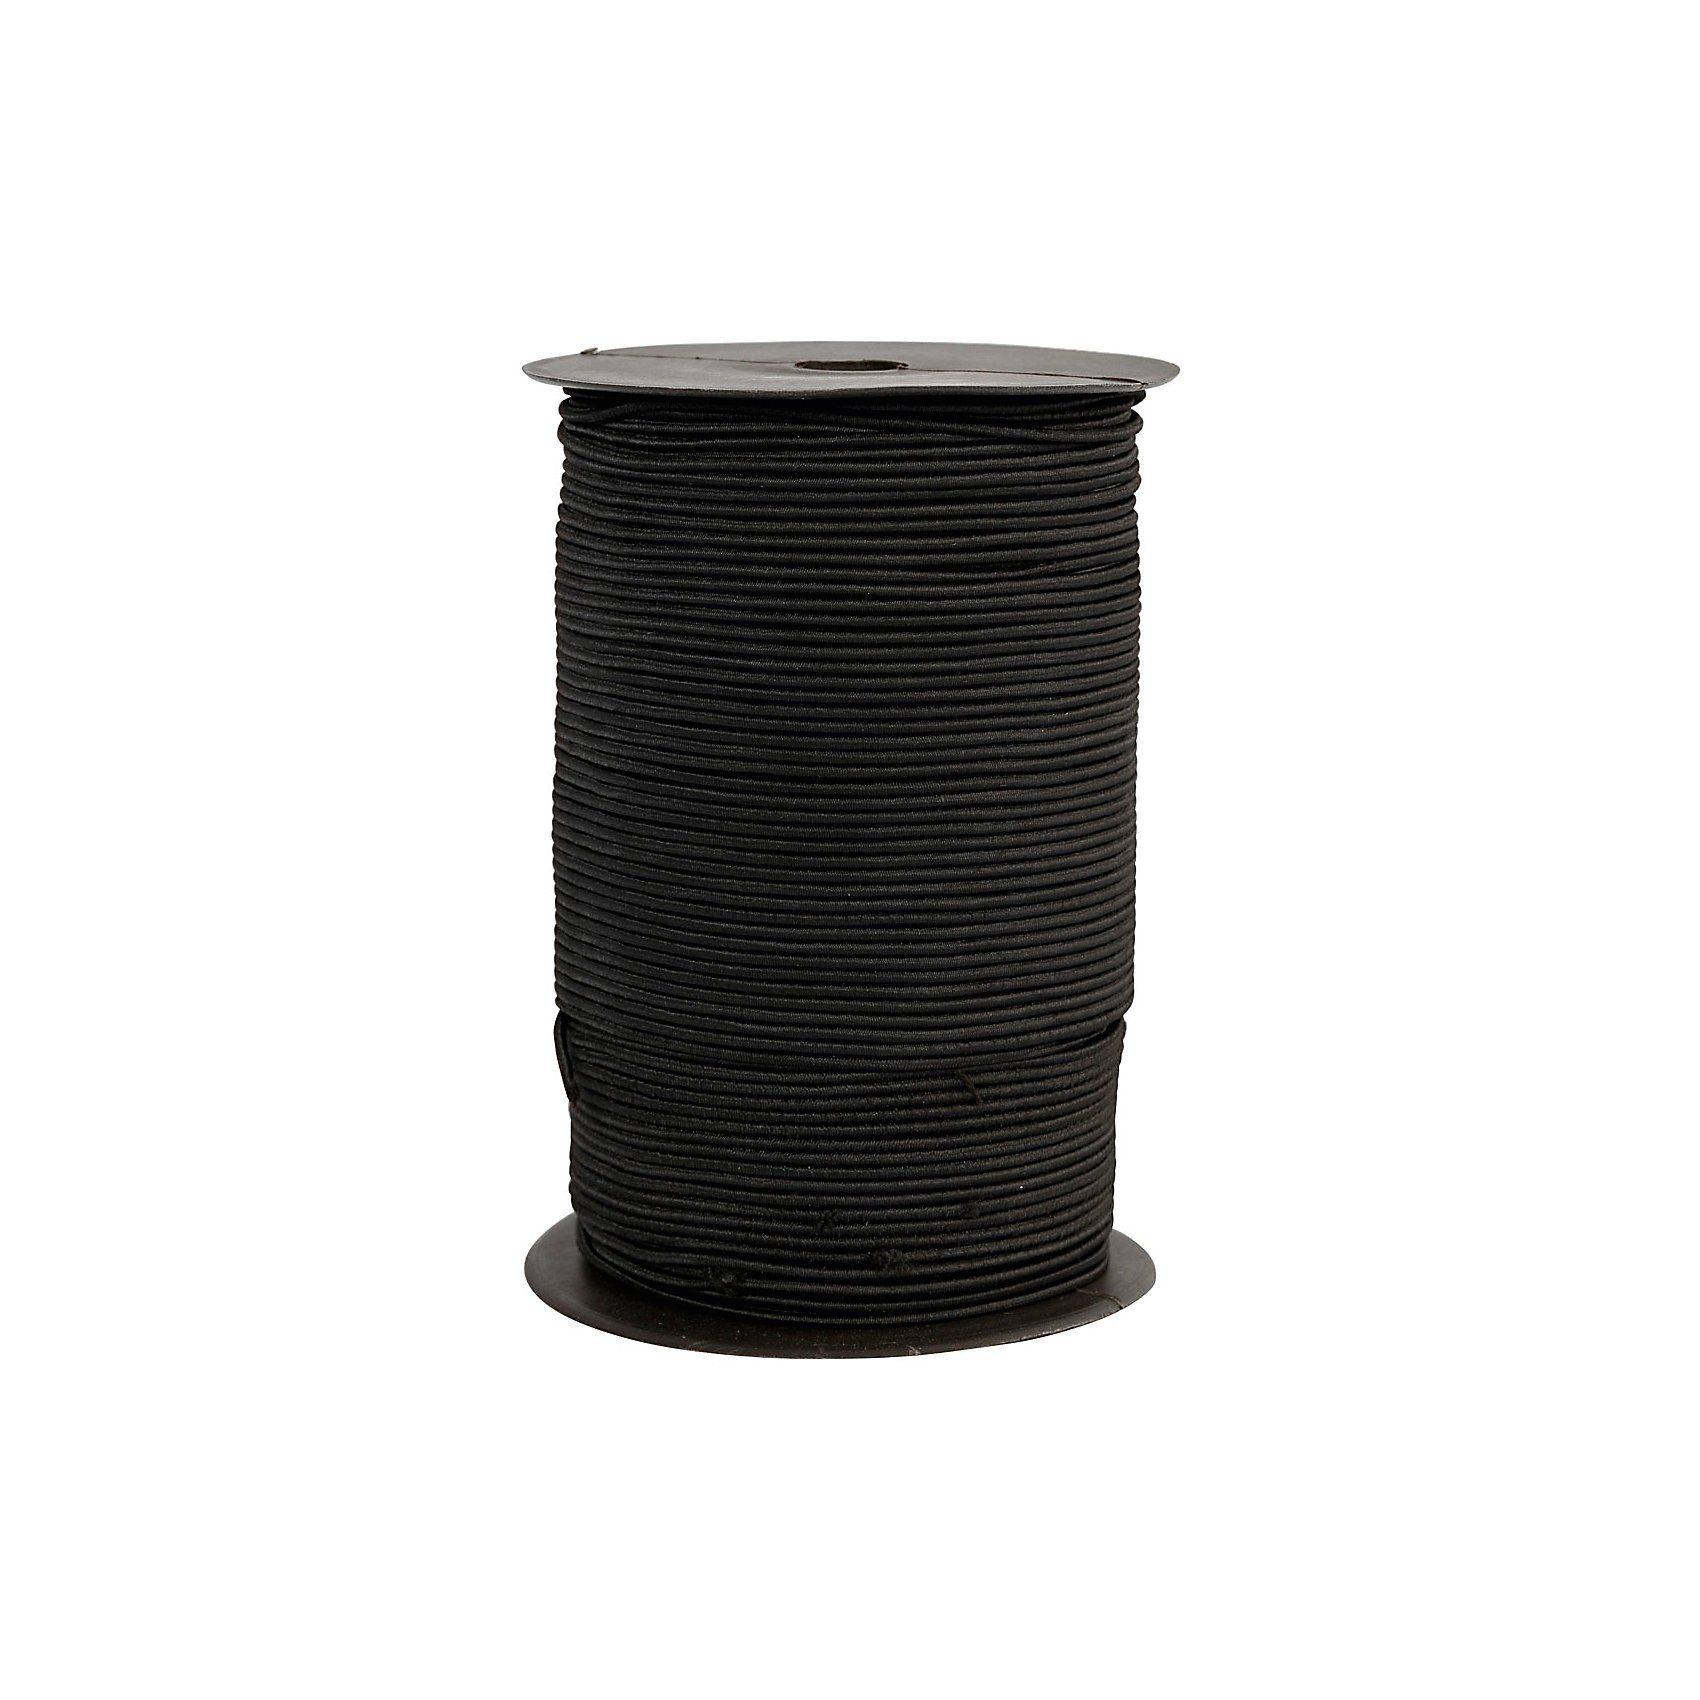 Elastikband, Stärke: 2 mm, 250 m, Schwarz